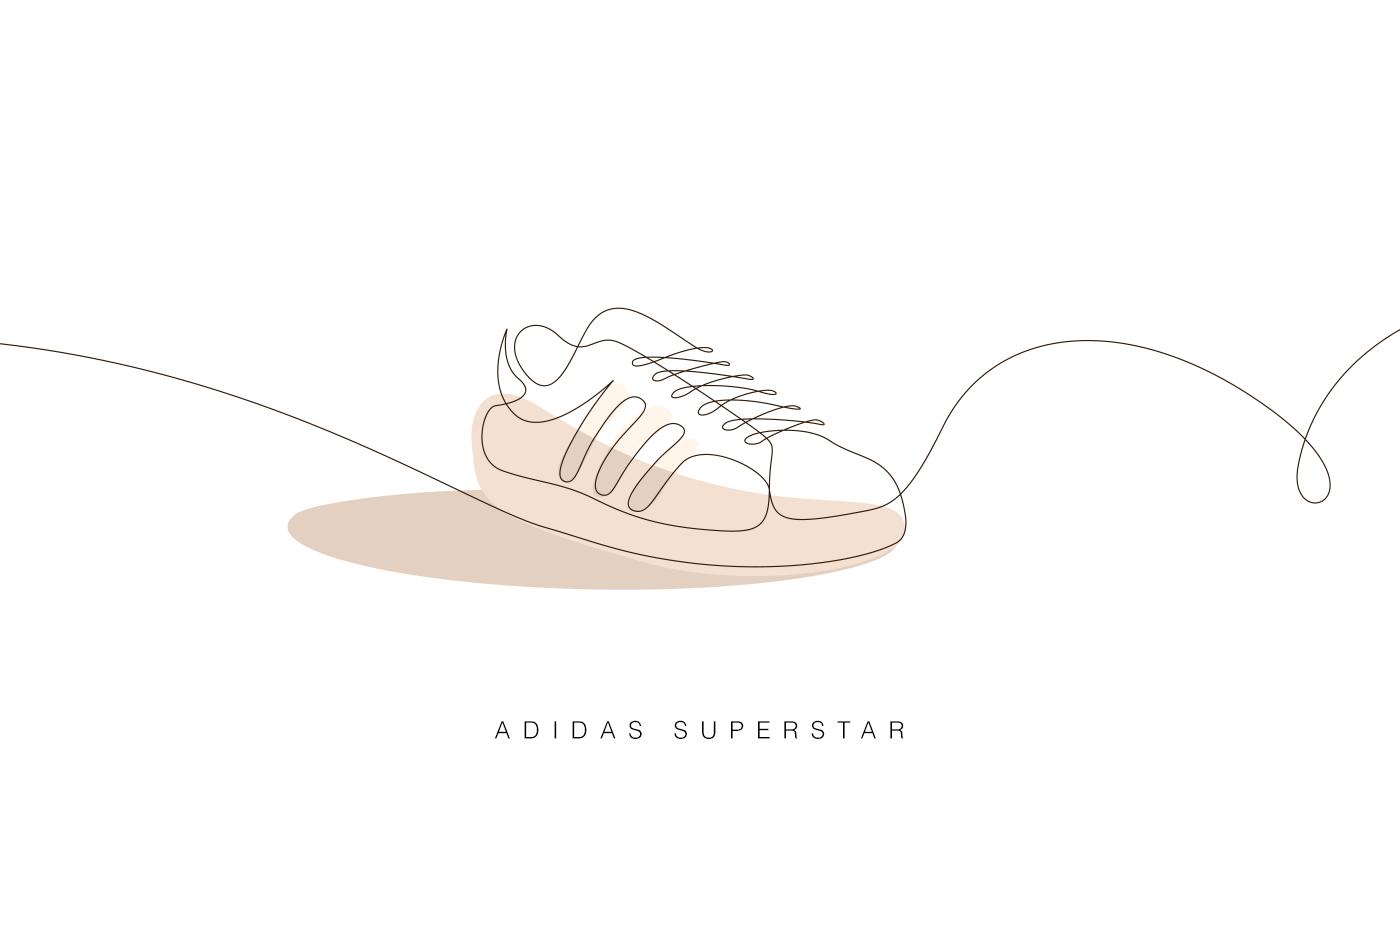 One Line Macro Art : Differantly studios one line sneaker drawings hypebeast